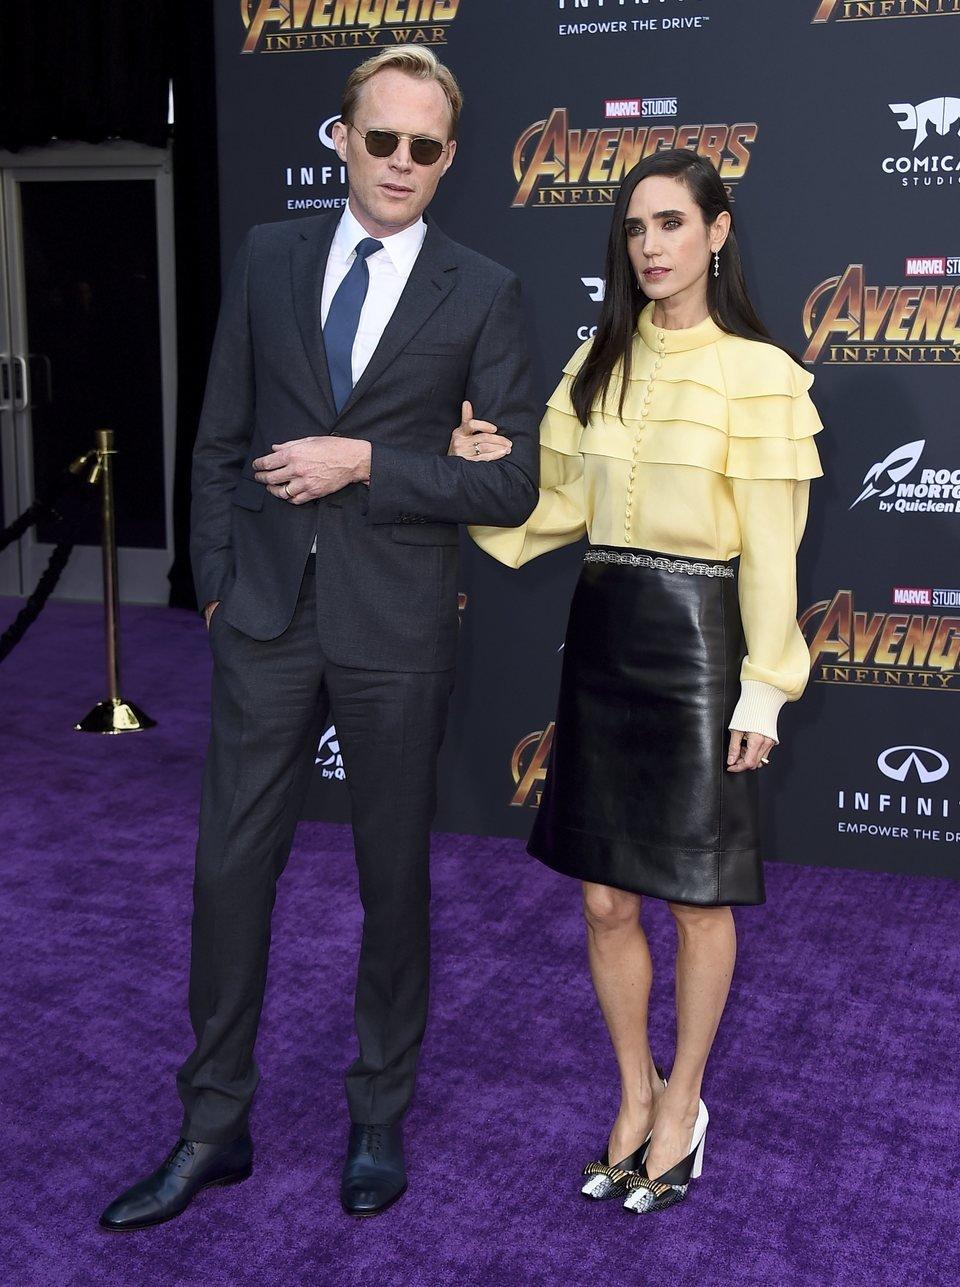 Paul Bettany y Jennifer Connelly juntos en la premiere de 'Vengadores: Infinity War'